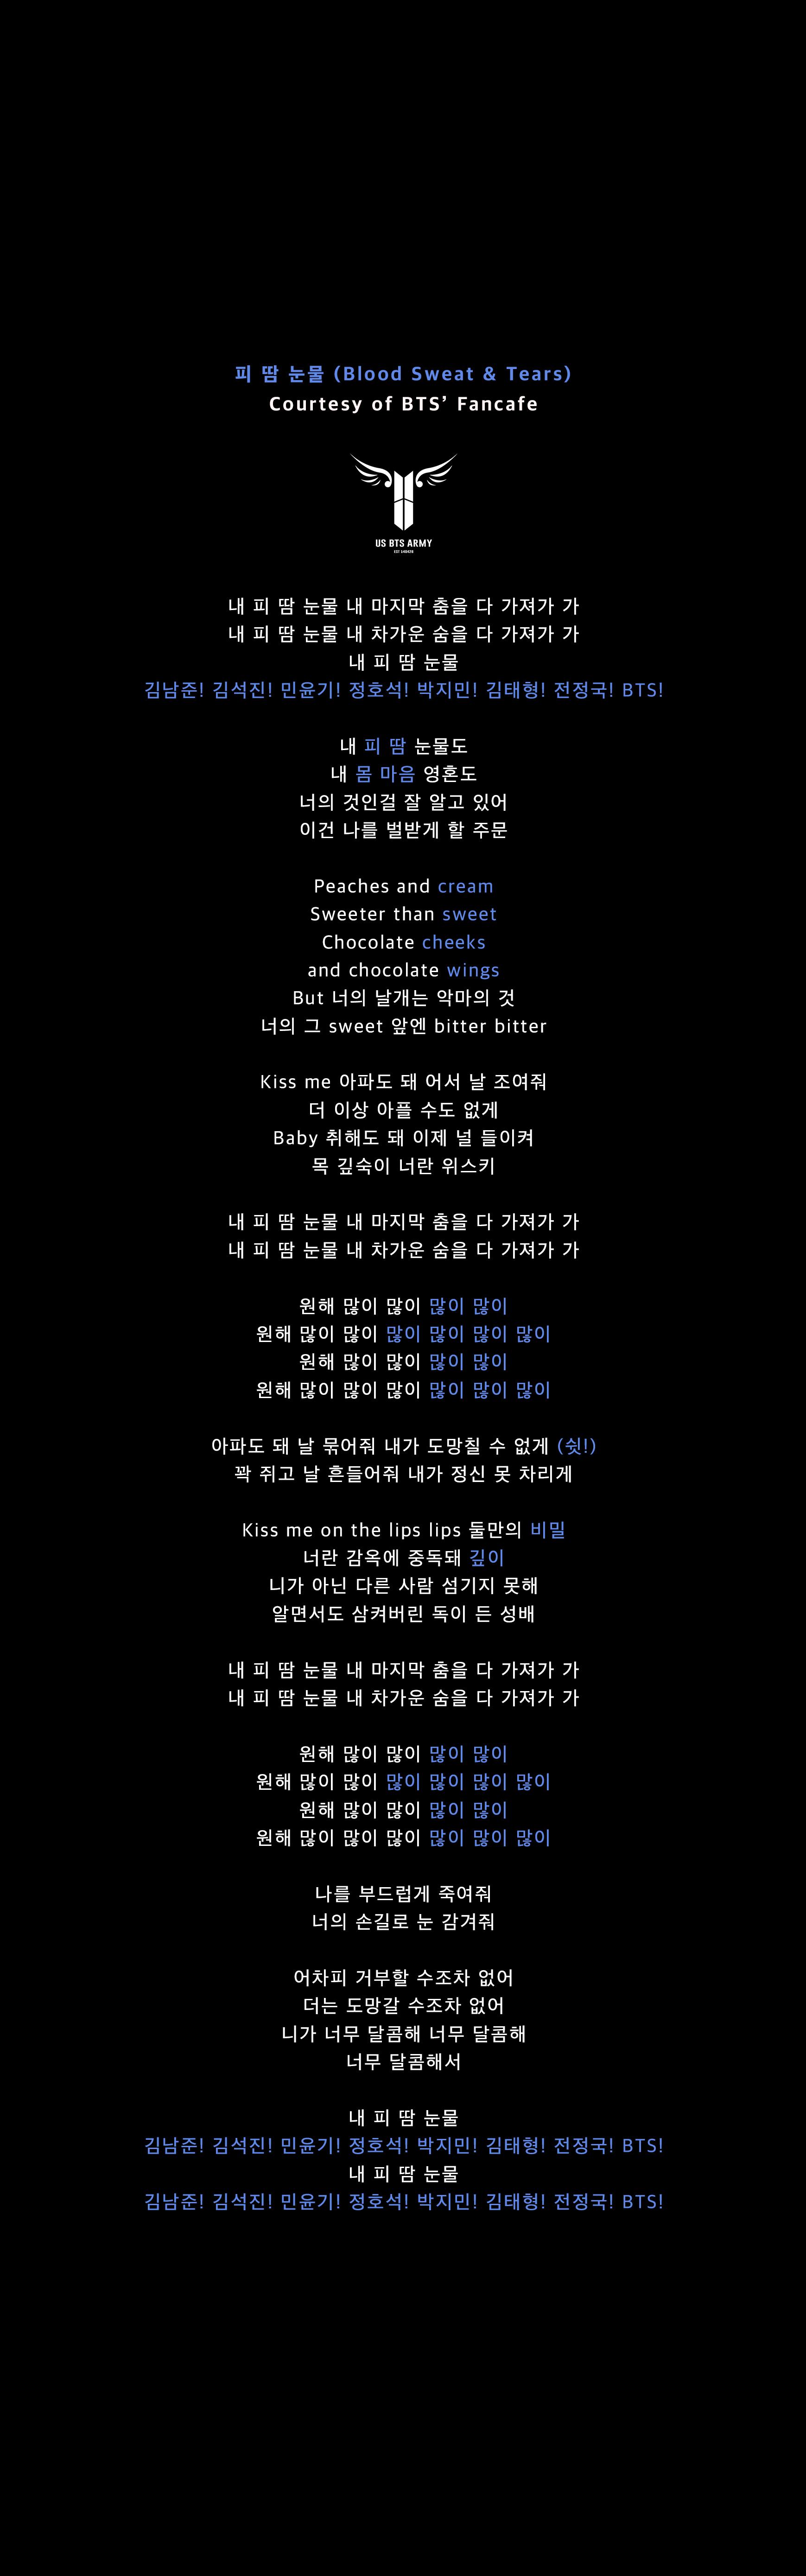 Blood Sweat And Tears Lyrics : blood, sweat, tears, lyrics, 눈물, (Blood, Sweat, Tears)', Fanchant